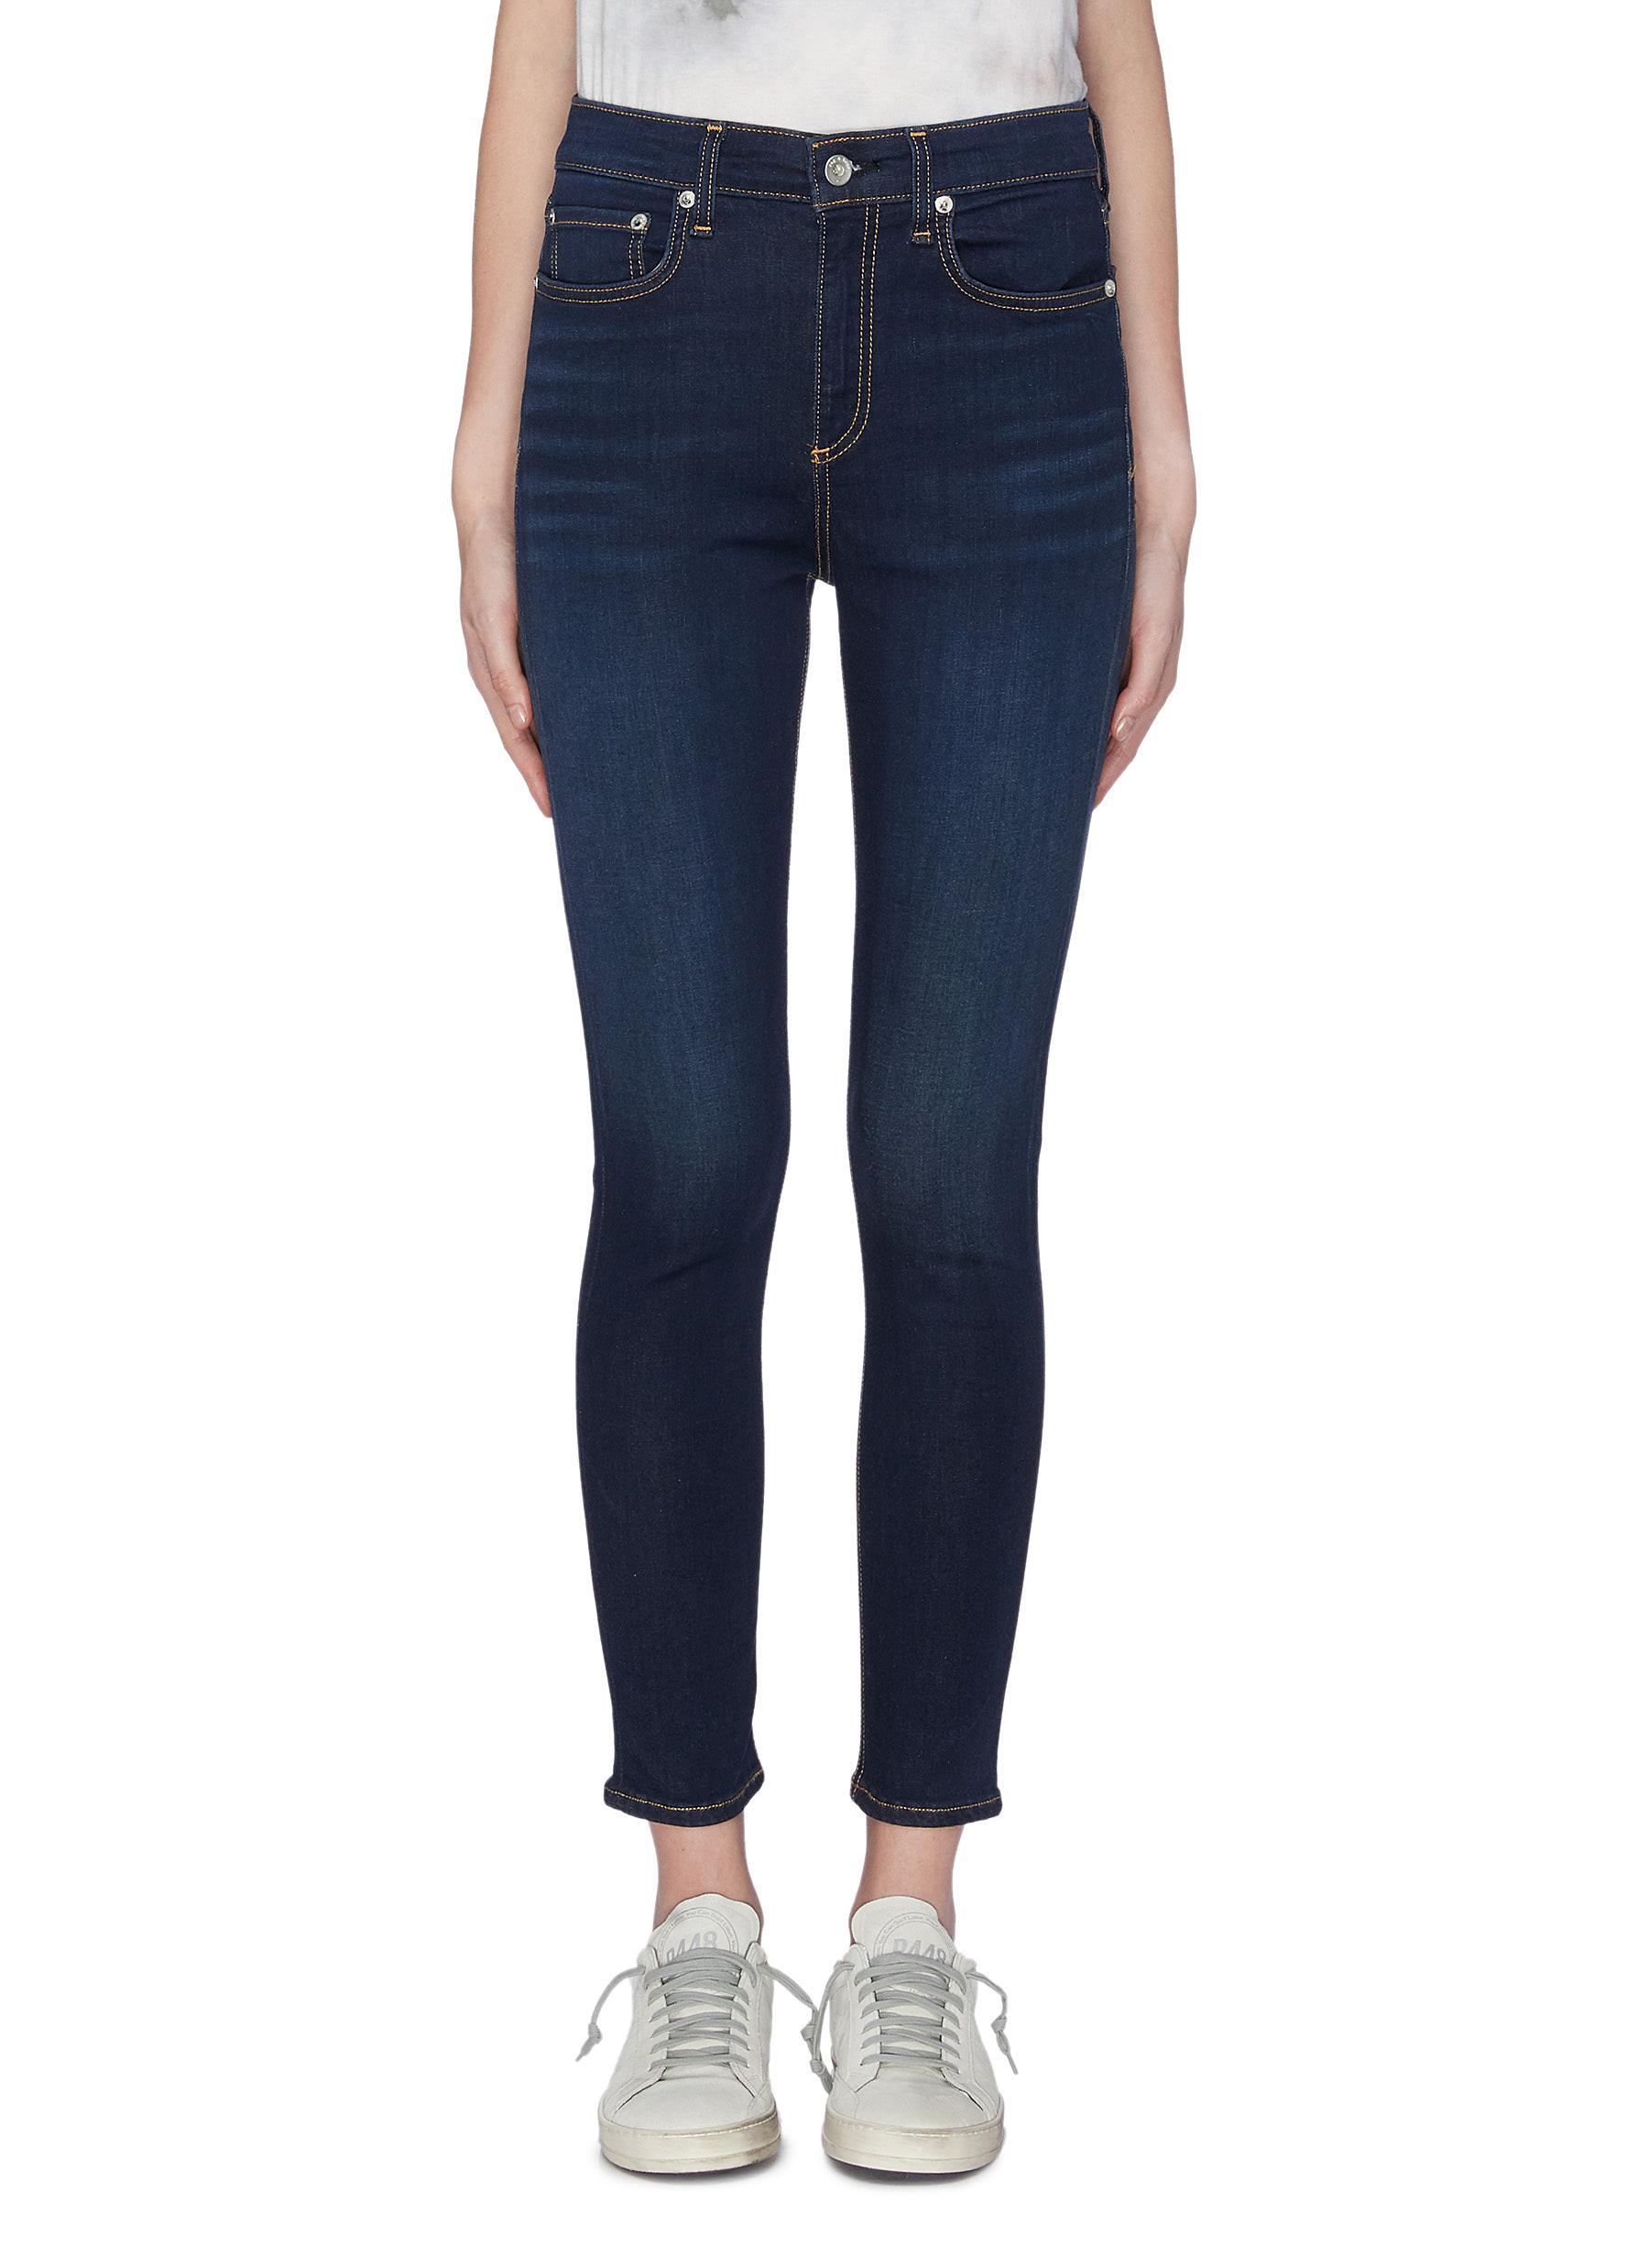 Nina cropped skinny jeans by Rag & Bone/Jean